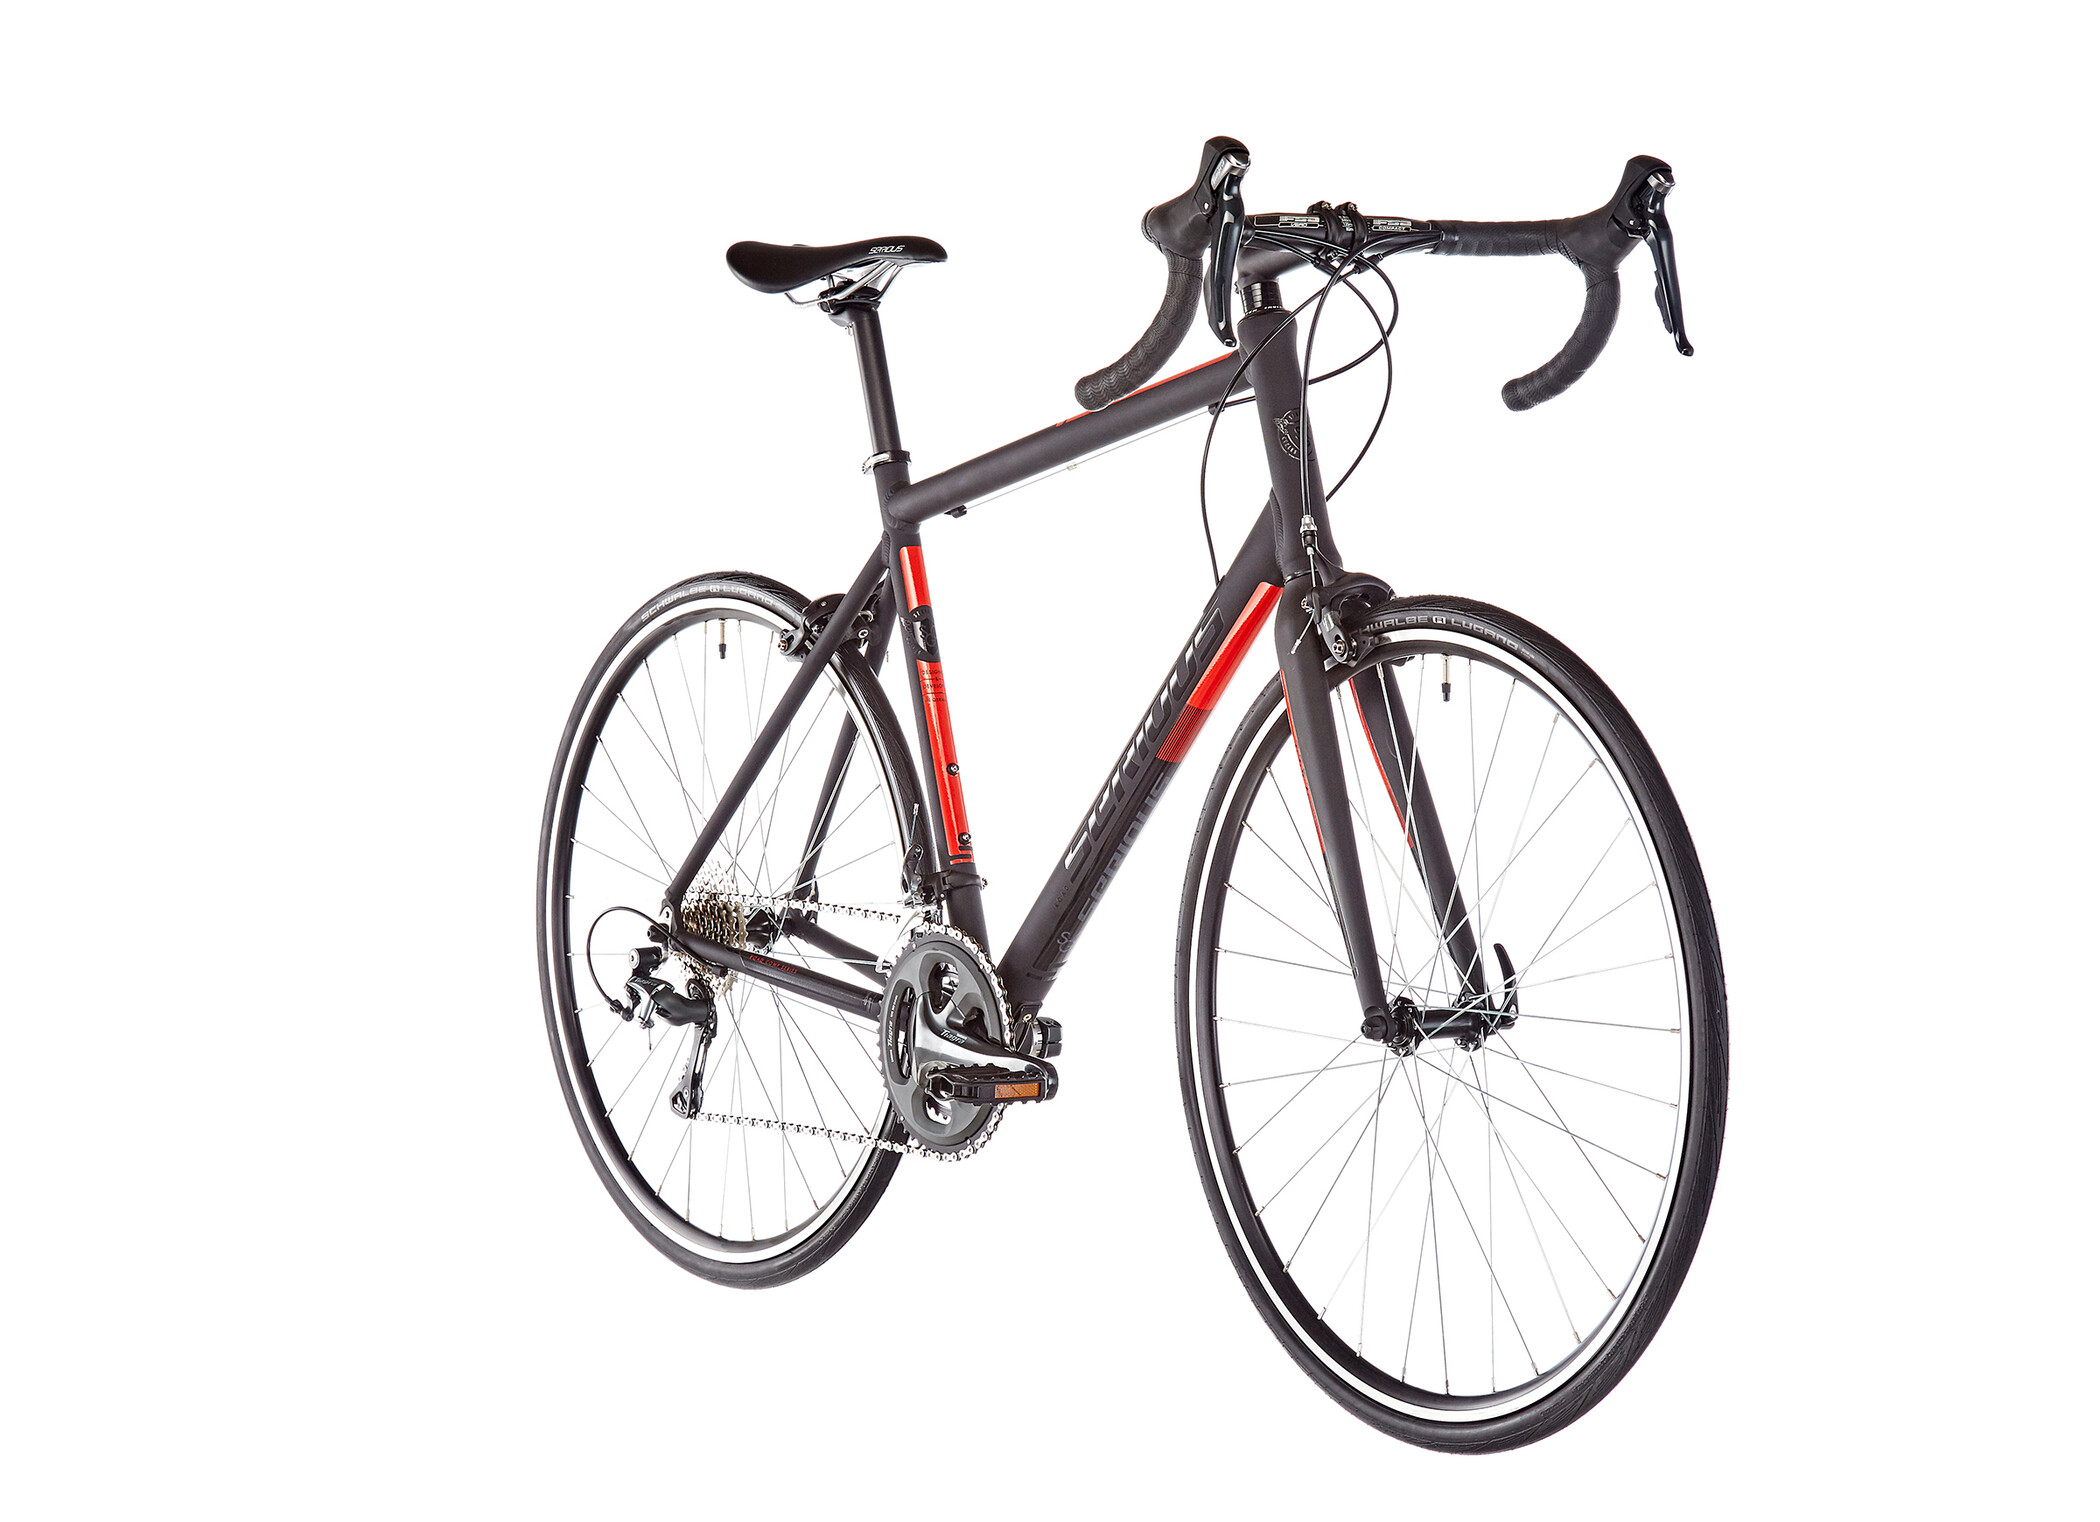 Serious Valparola Comp, black (2019) | Road bikes